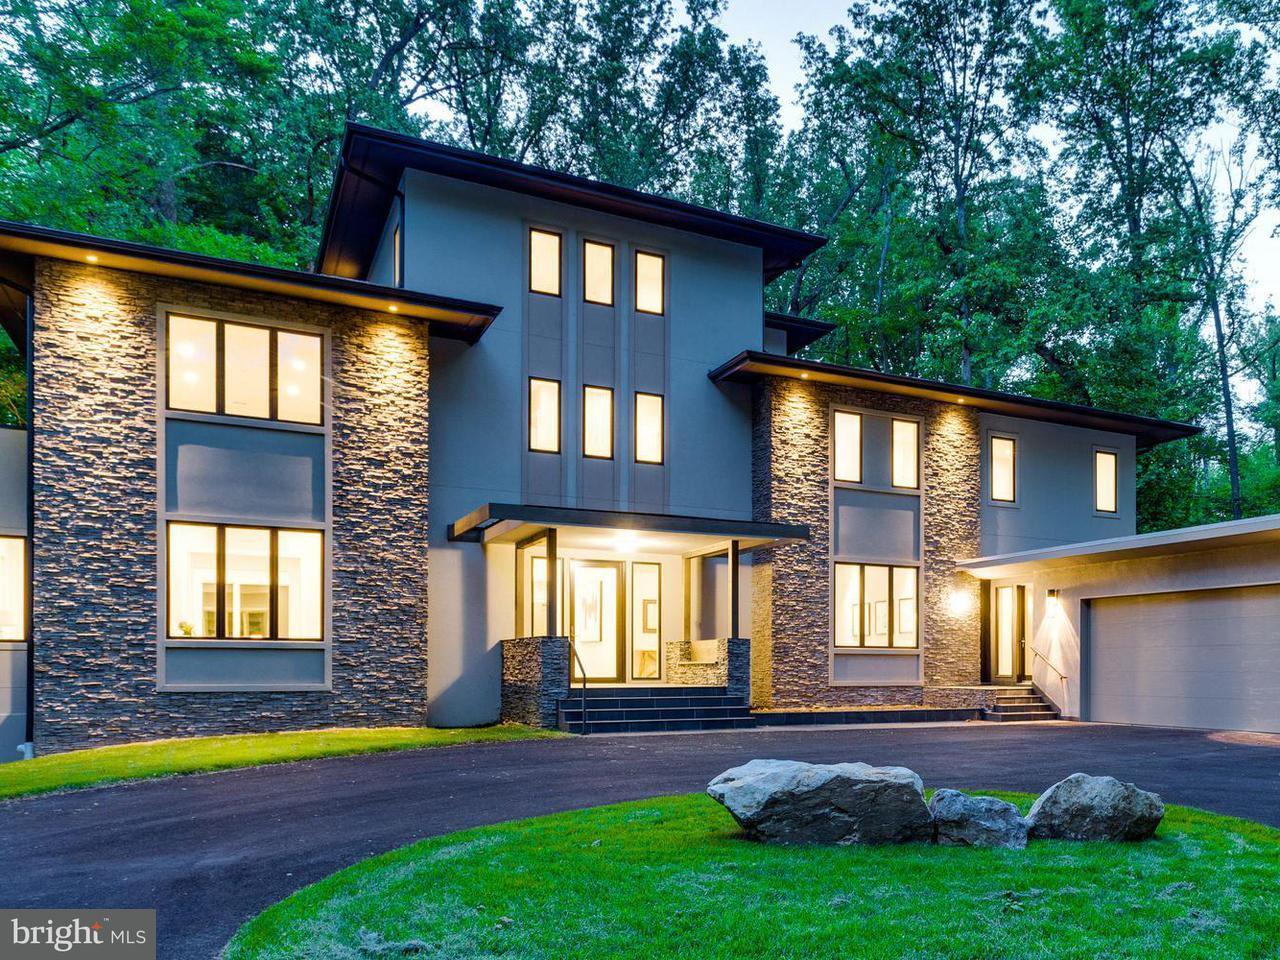 Single Family Home for Sale at 8920 Burdette Road 8920 Burdette Road Bethesda, Maryland 20817 United States